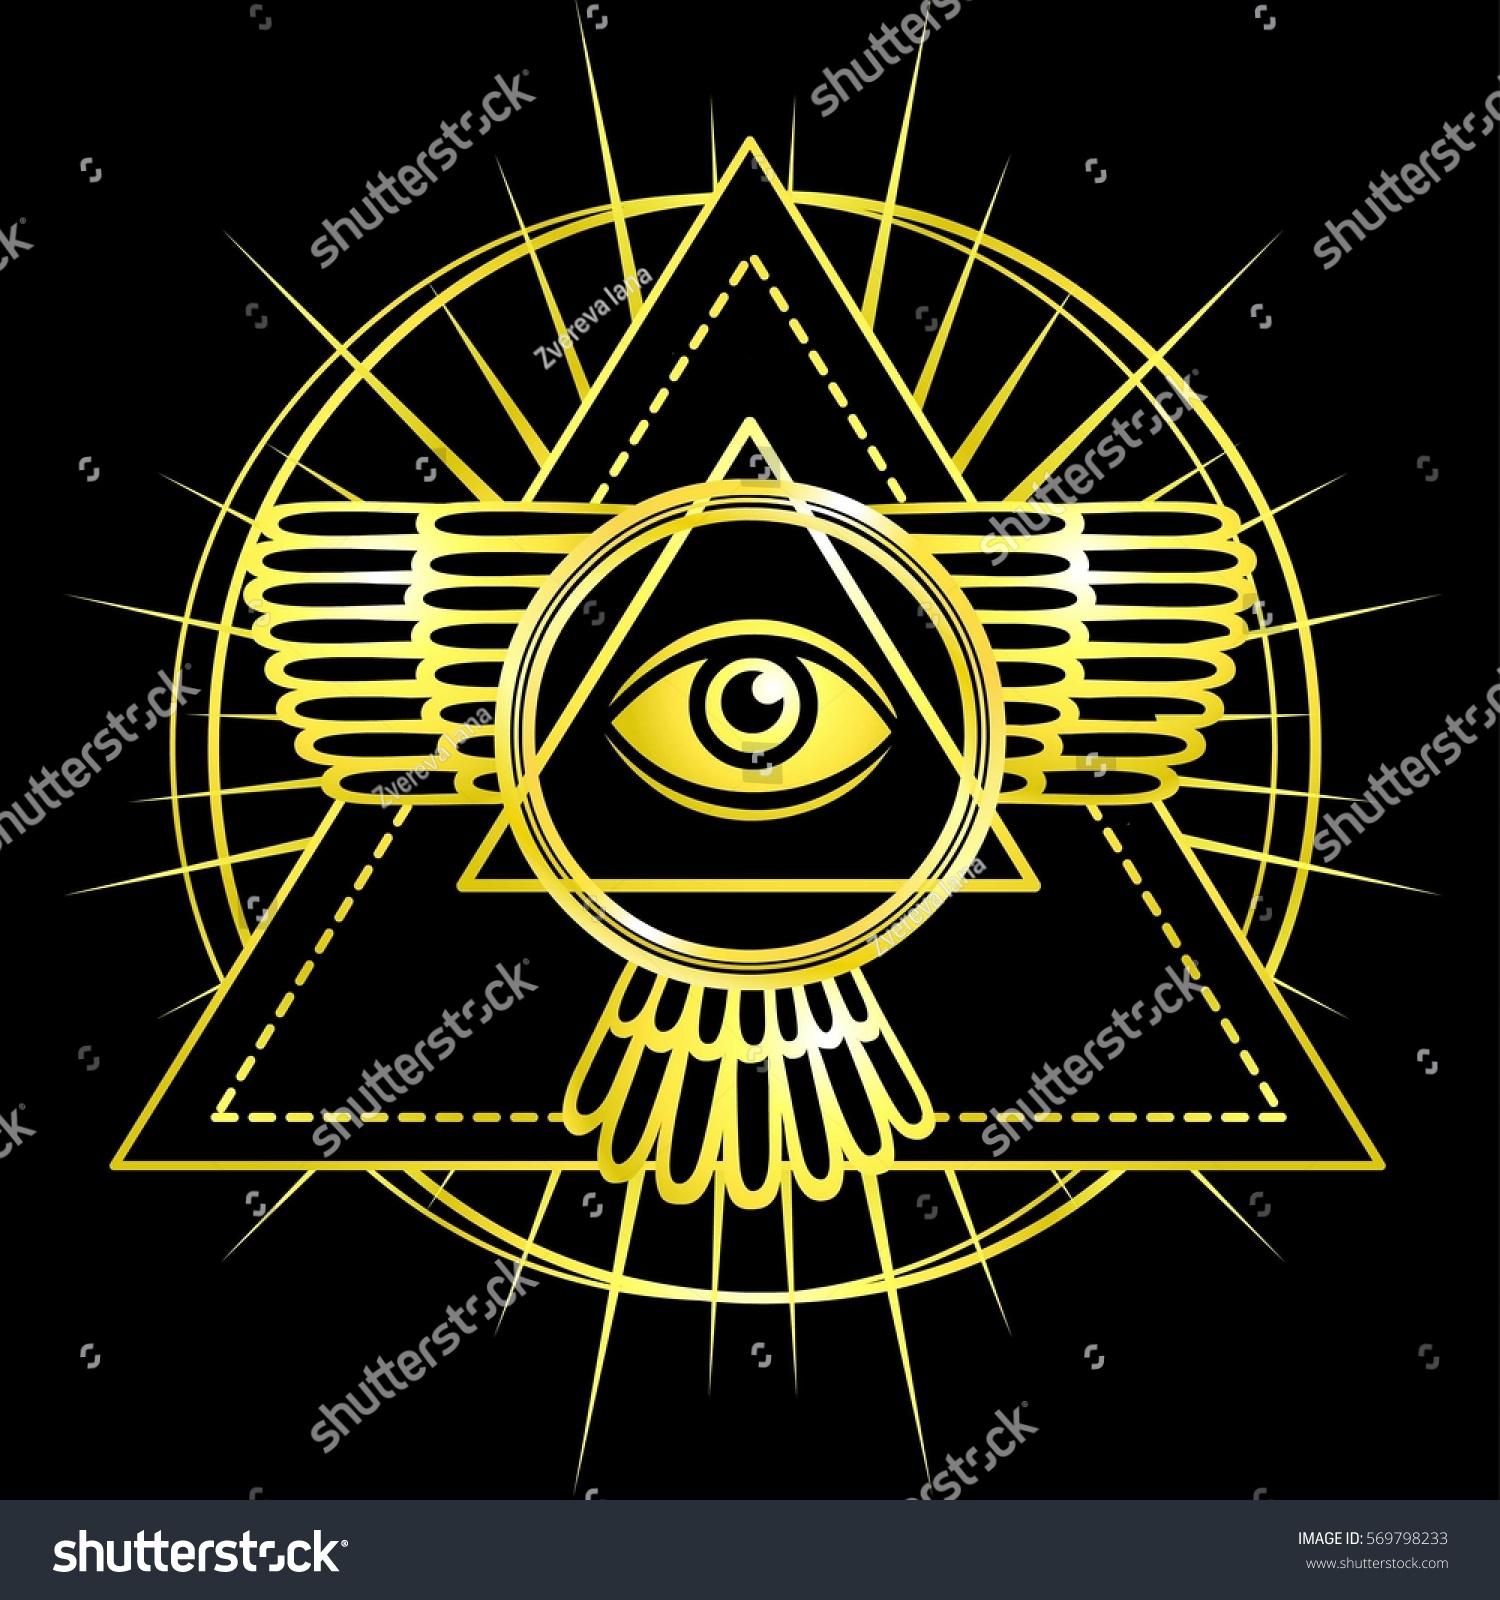 Eye providence all seeing eye inside stock vector 569798233 all seeing eye inside triangle pyramid esoteric symbol sacred geometry buycottarizona Image collections